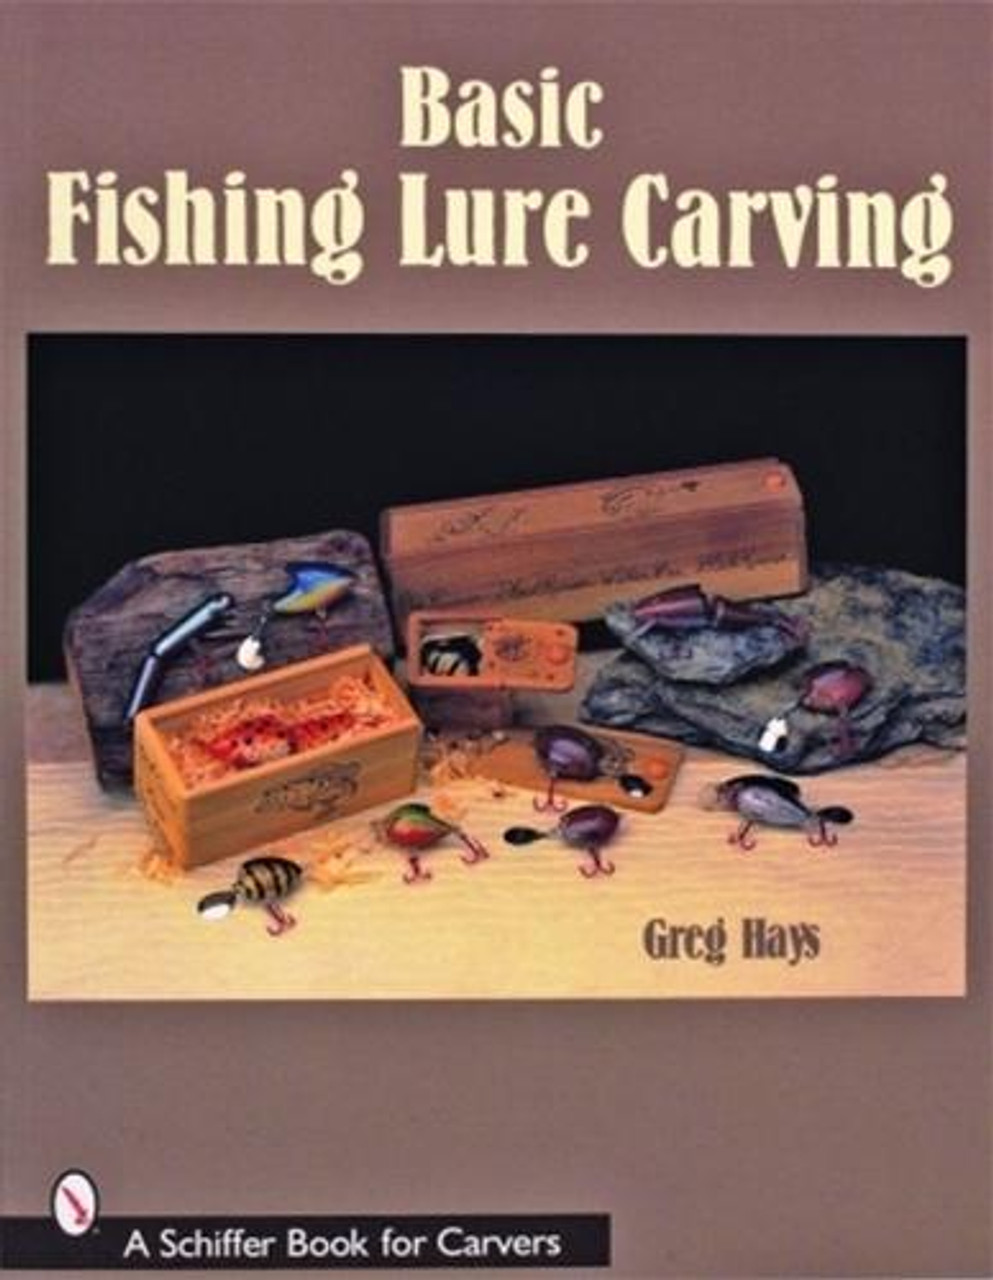 Schiffer Publishing Basic Fishing Lure Carving